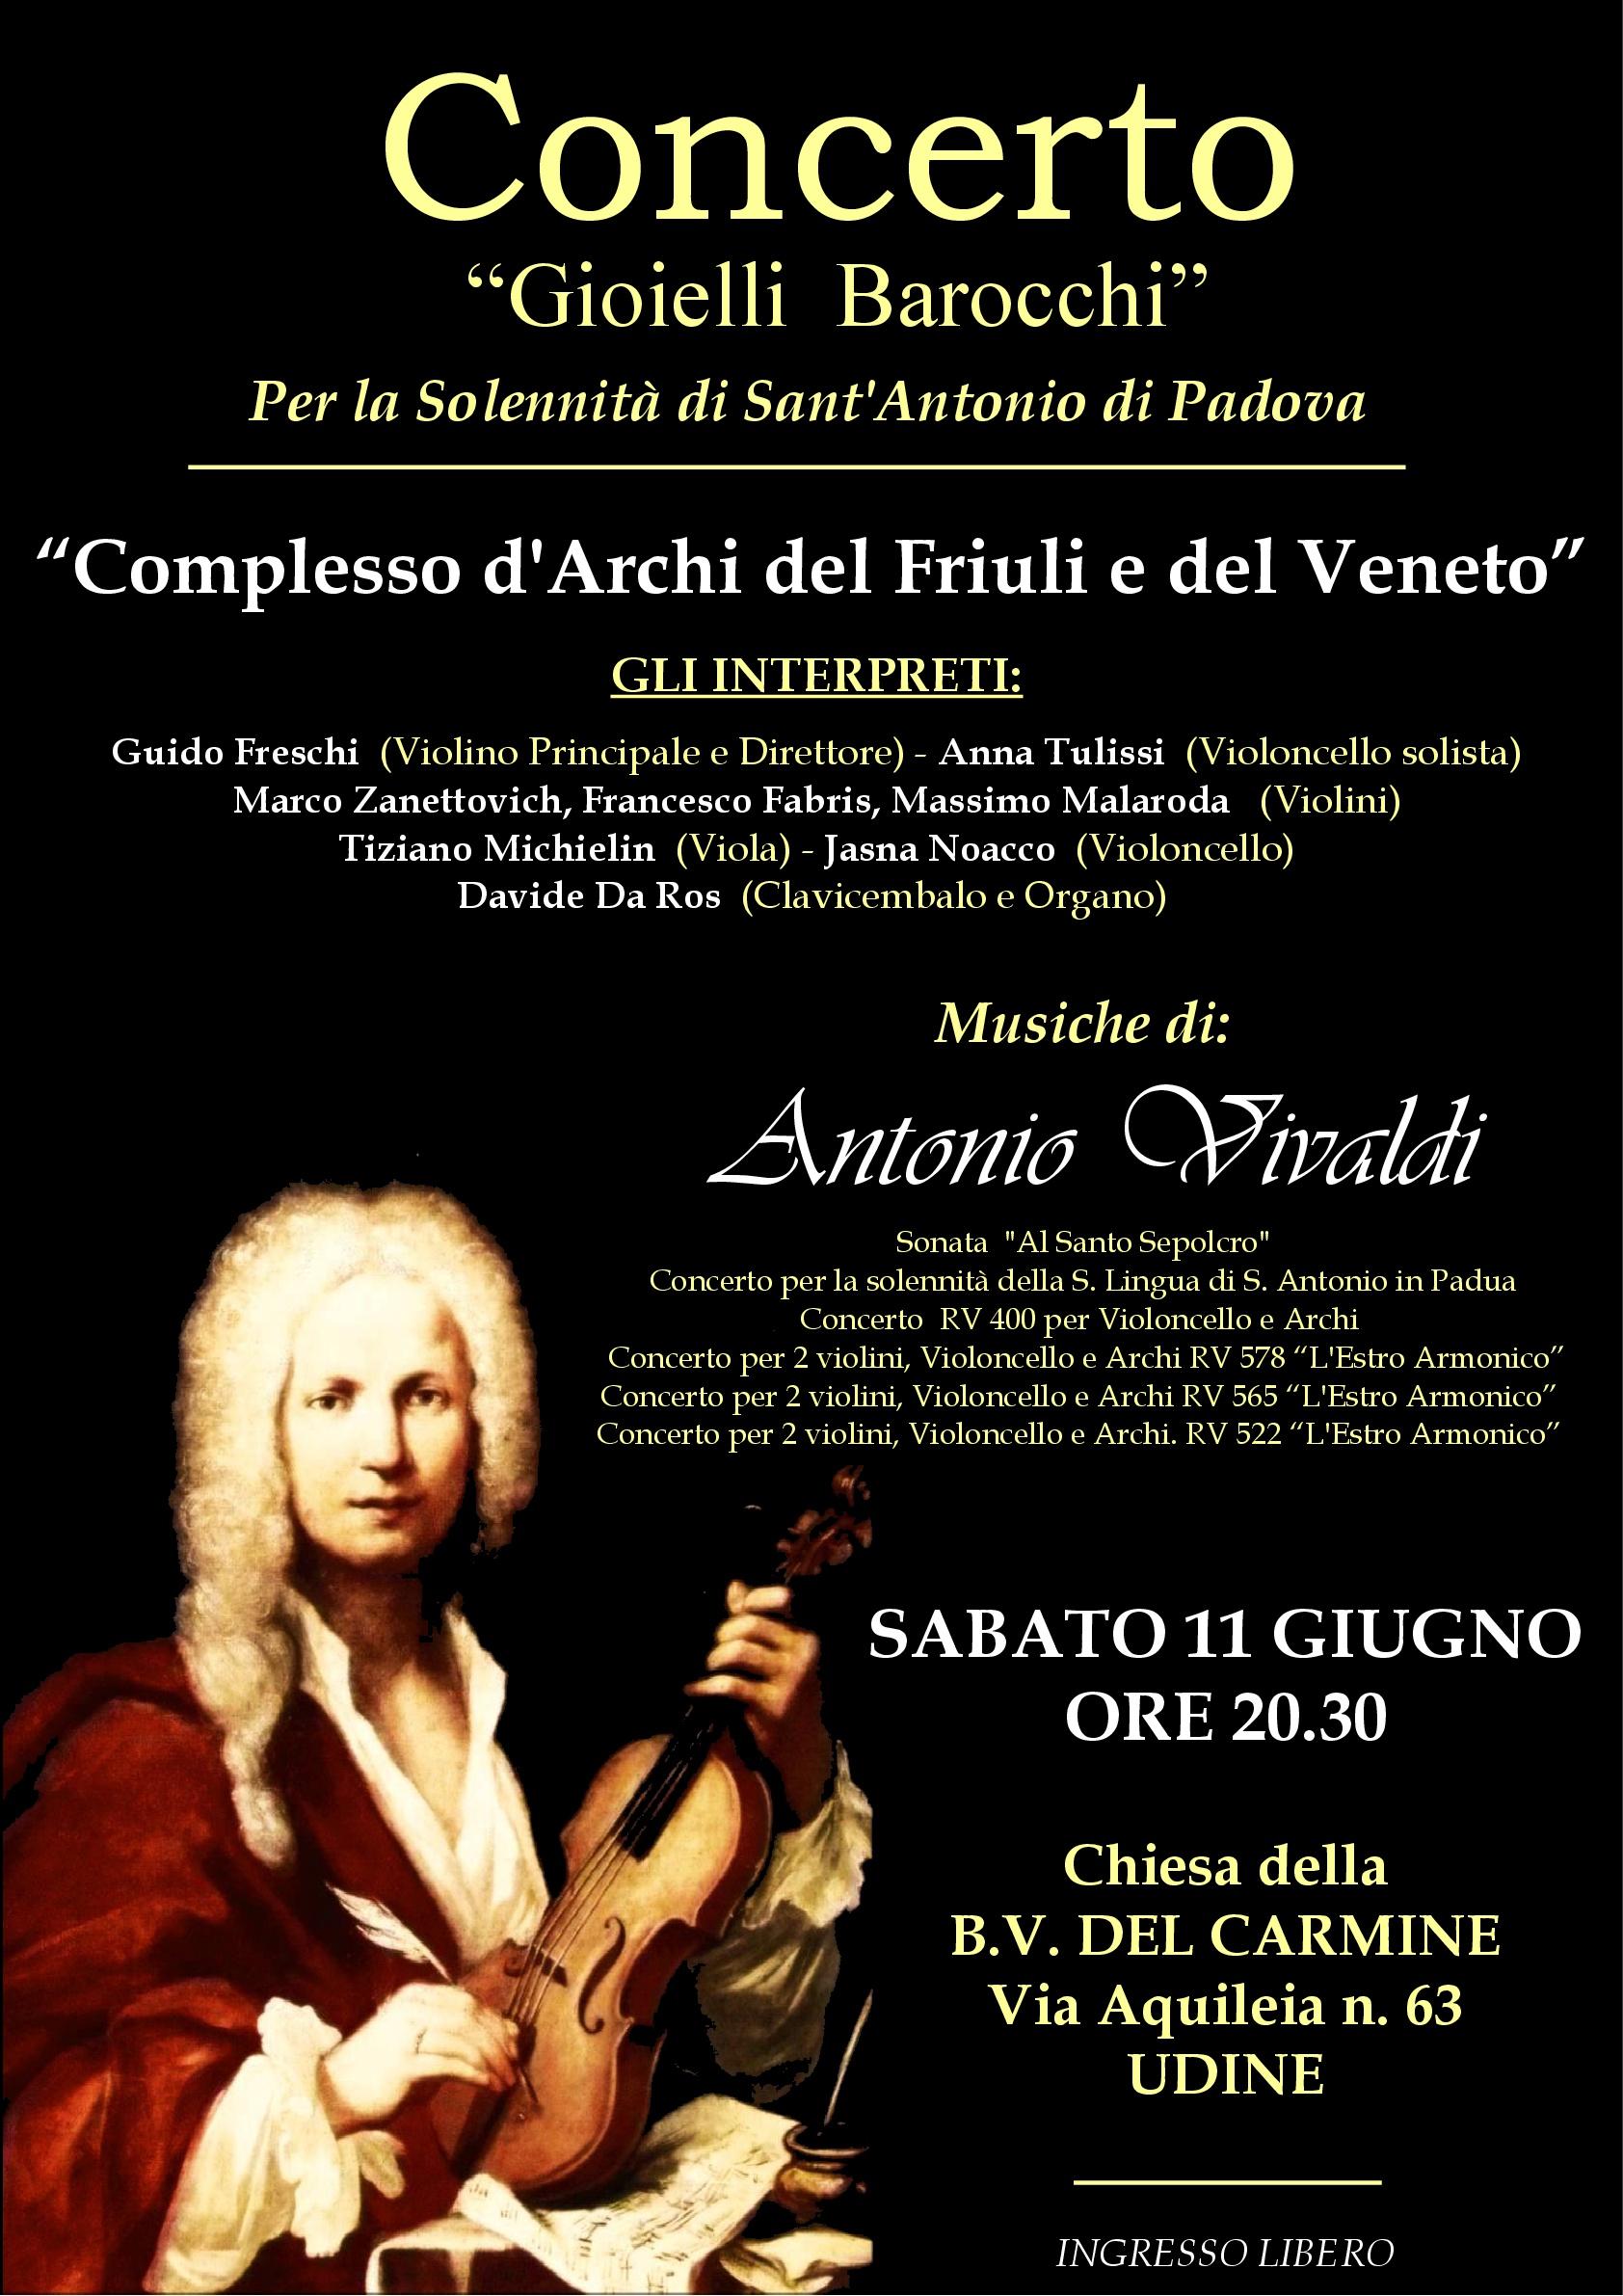 Concerto S.Antonio 2016 locandina-001